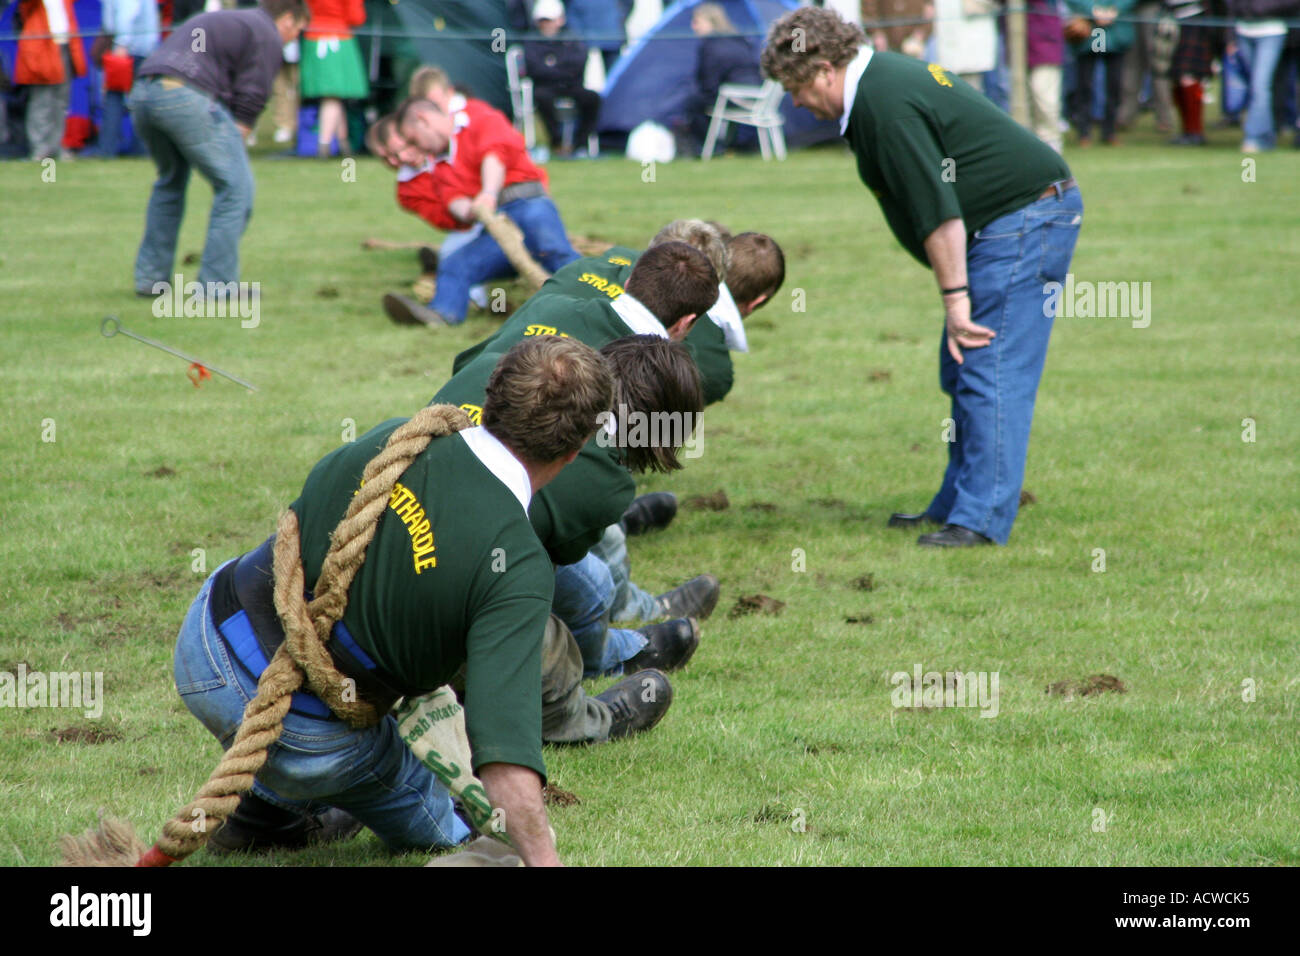 Tug of war competition, Blair Atholl Highland Games, Blair Atholl, Perthshire, Scotland - Stock Image